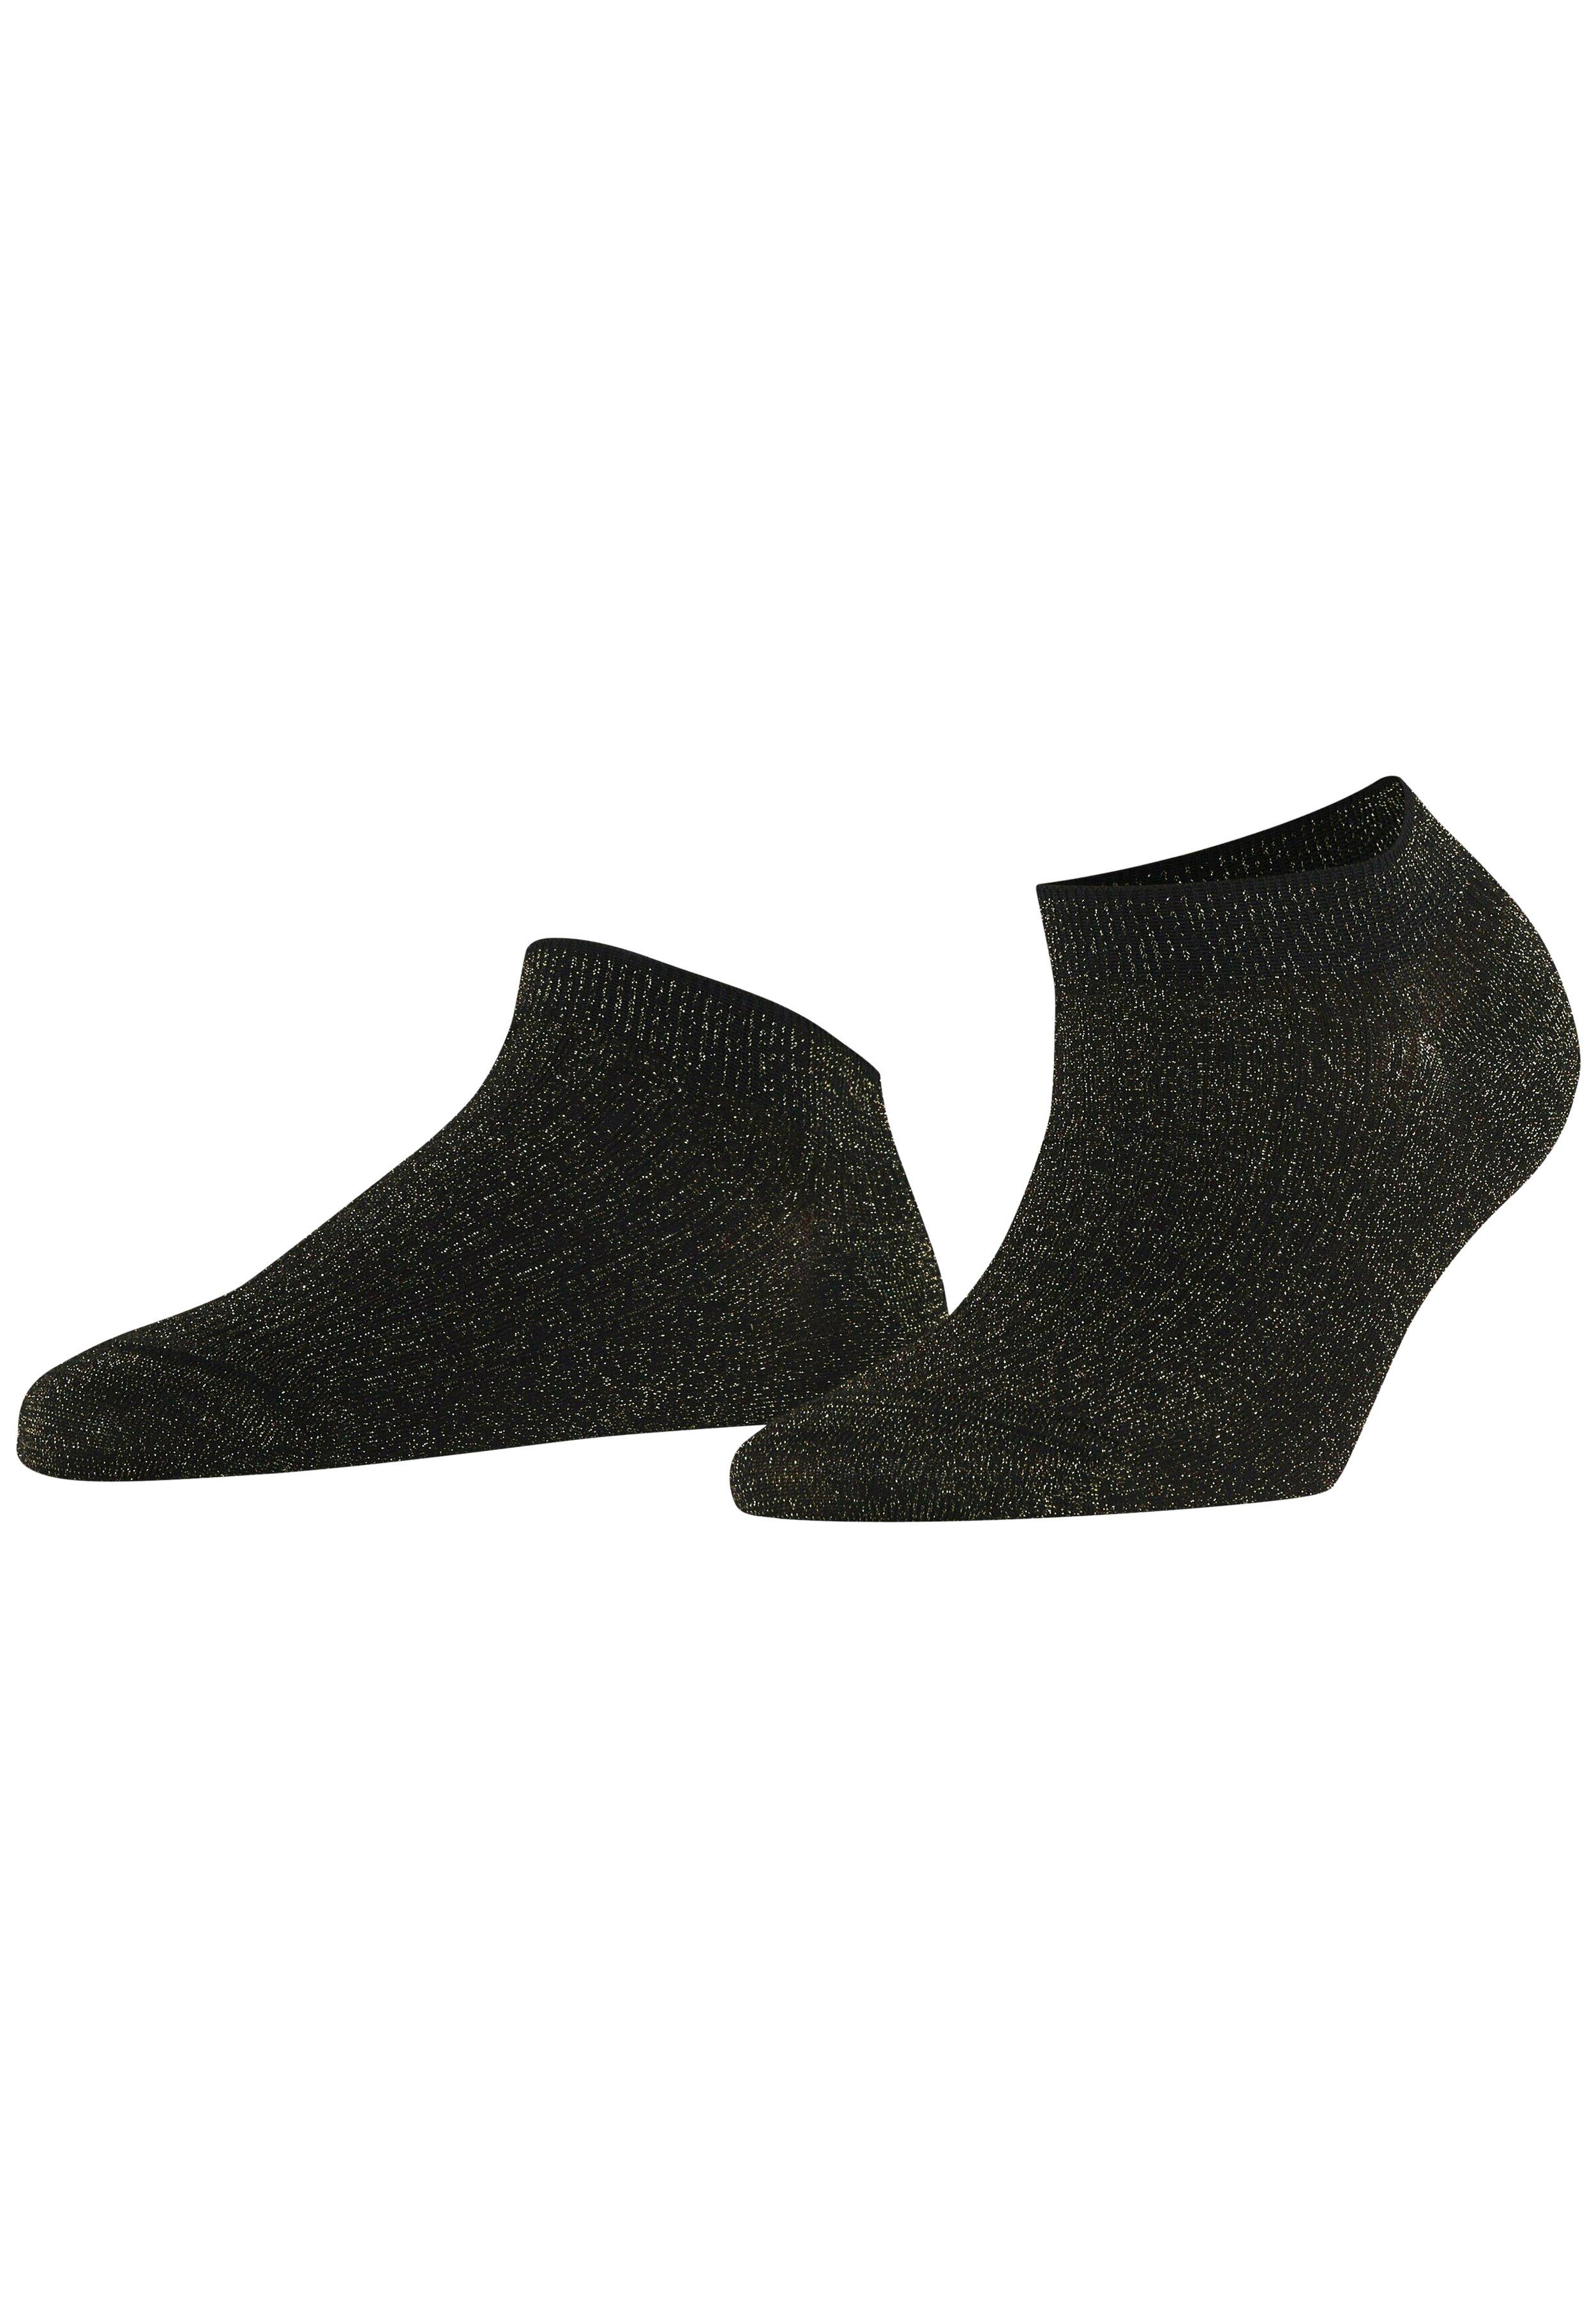 Femme SHINY  - Chaussettes - black